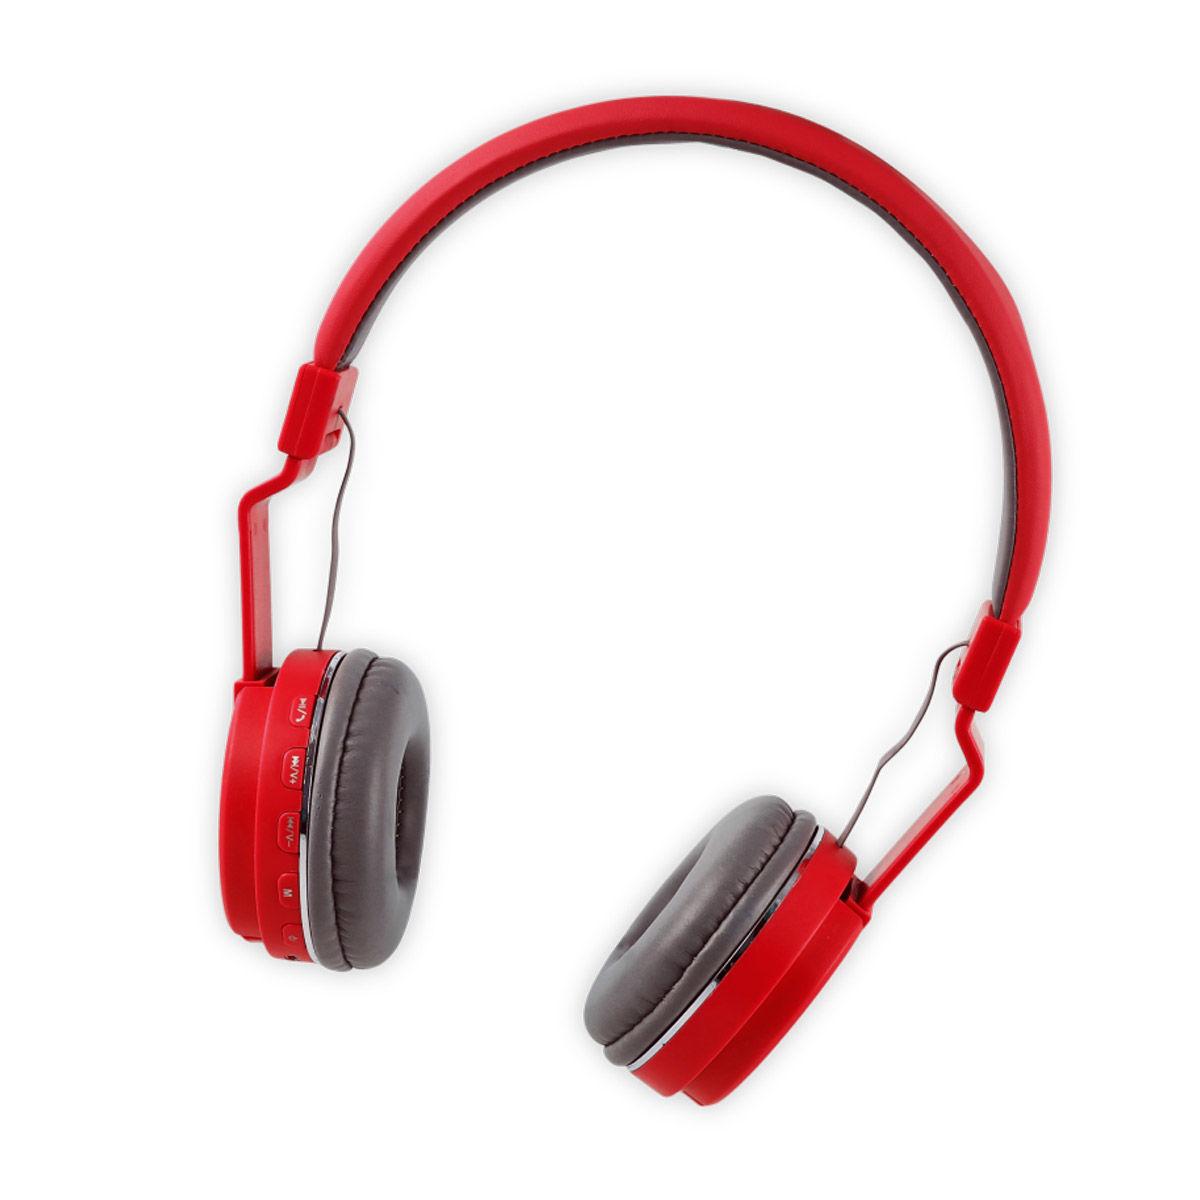 Buy Wireless Bluetooth Headphones Online At Best Price In India On Naaptol Com